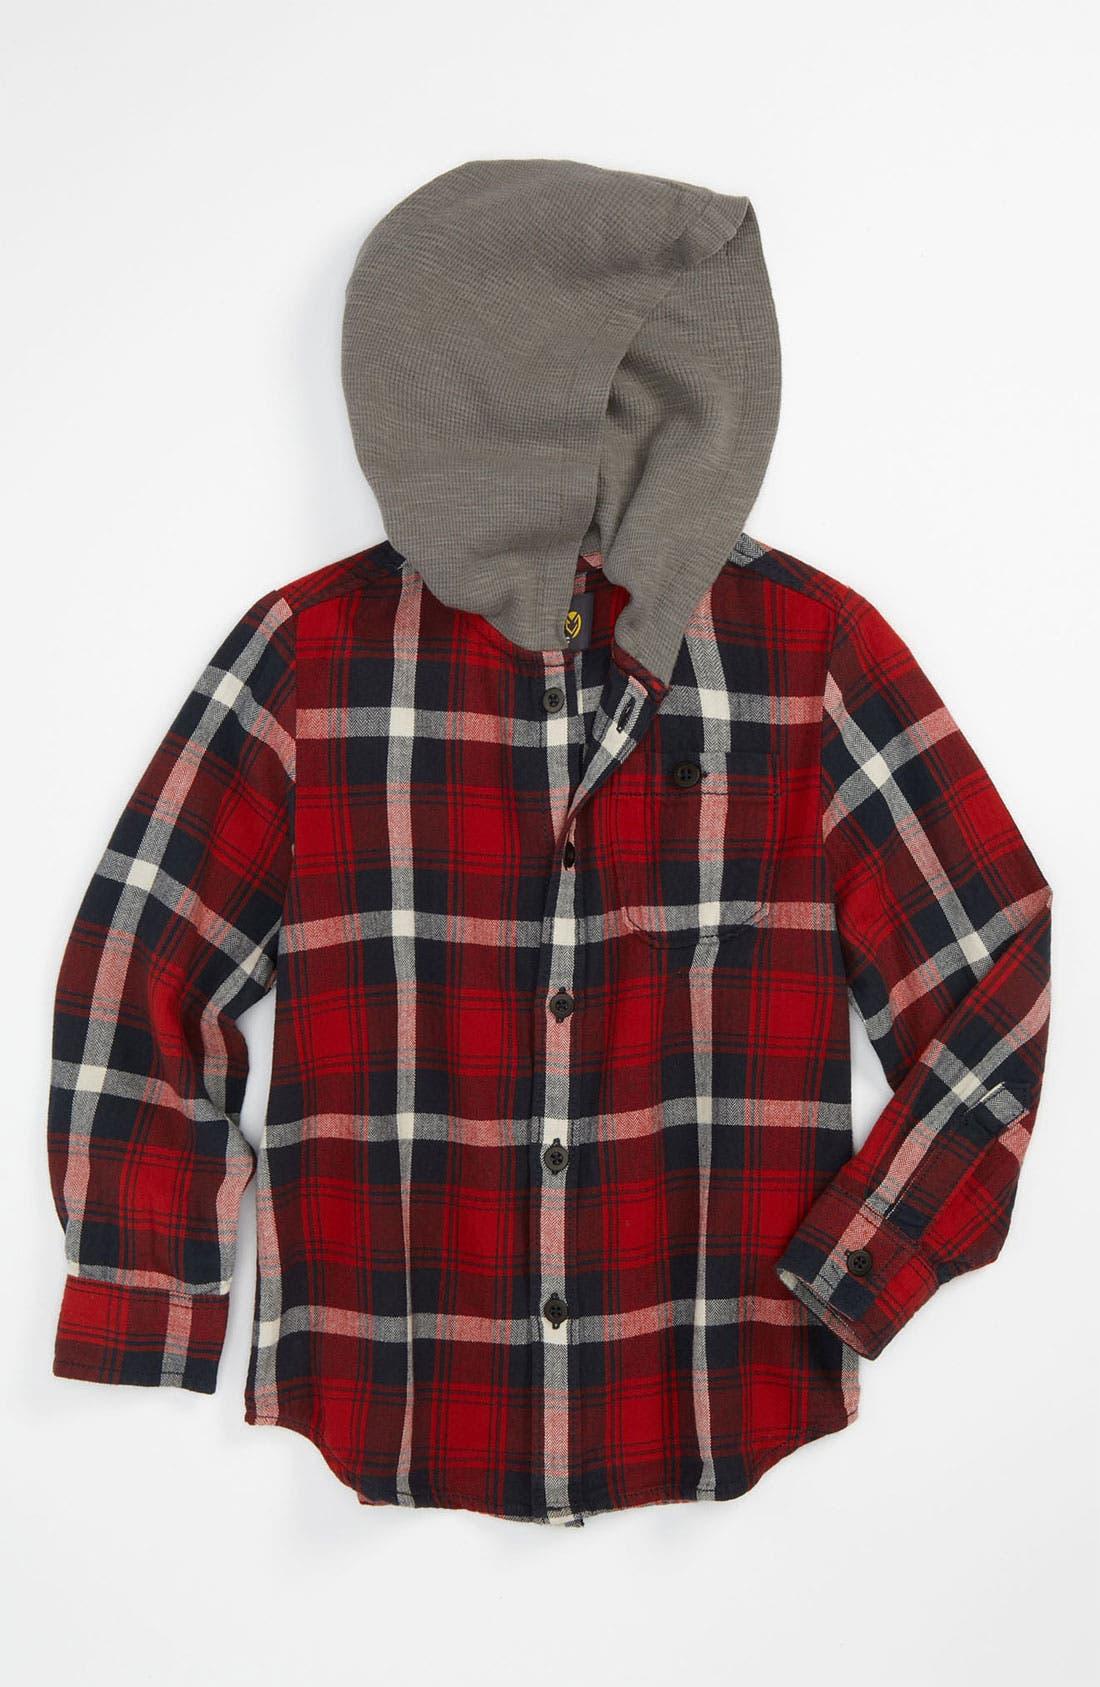 Alternate Image 1 Selected - Pure Stuff 'Hunter' Woven Shirt (Little Boys)